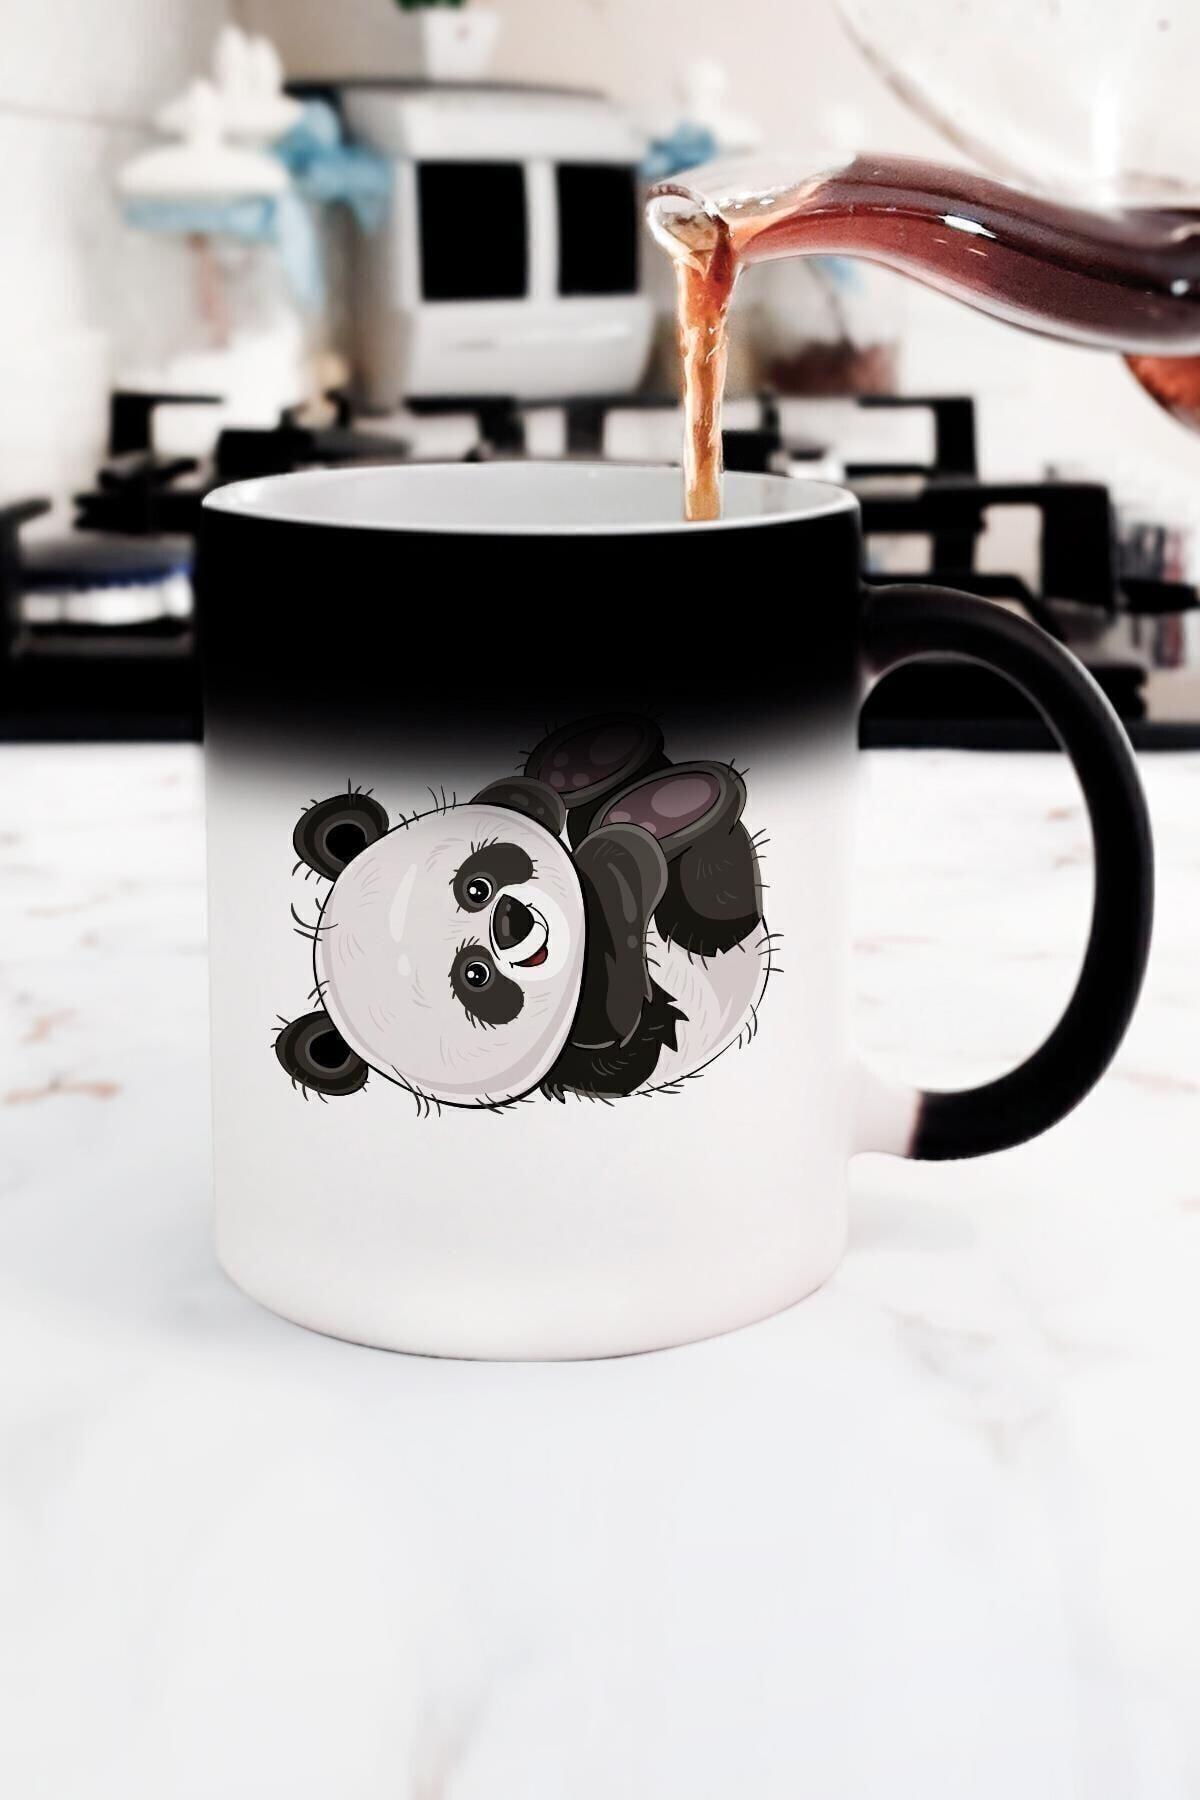 Yaprak Hediyelik Sevimli Panda Sihirli Kupa Bardak 1